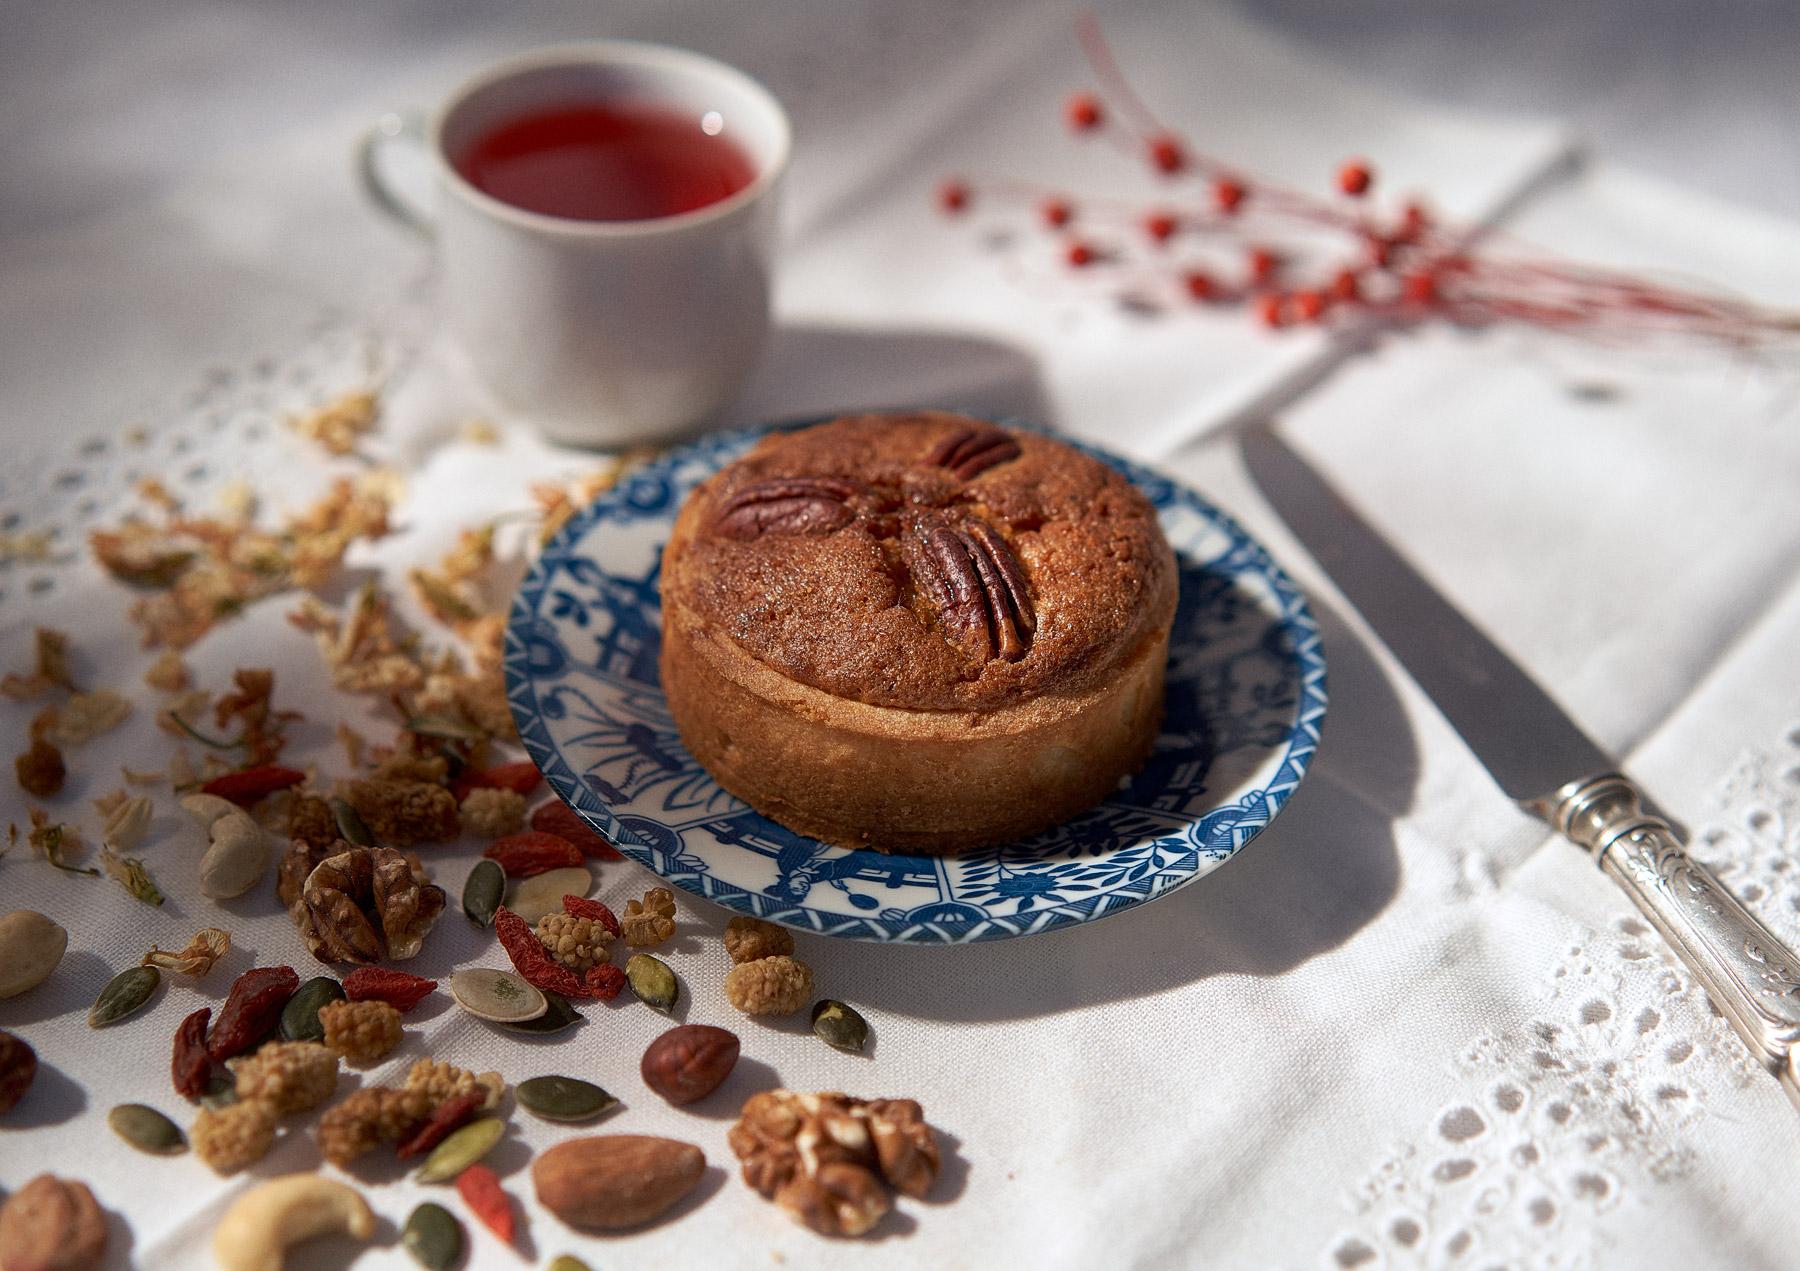 noix-fruits-secs-tea-the-infusion-herboristerie-tournai-photographe